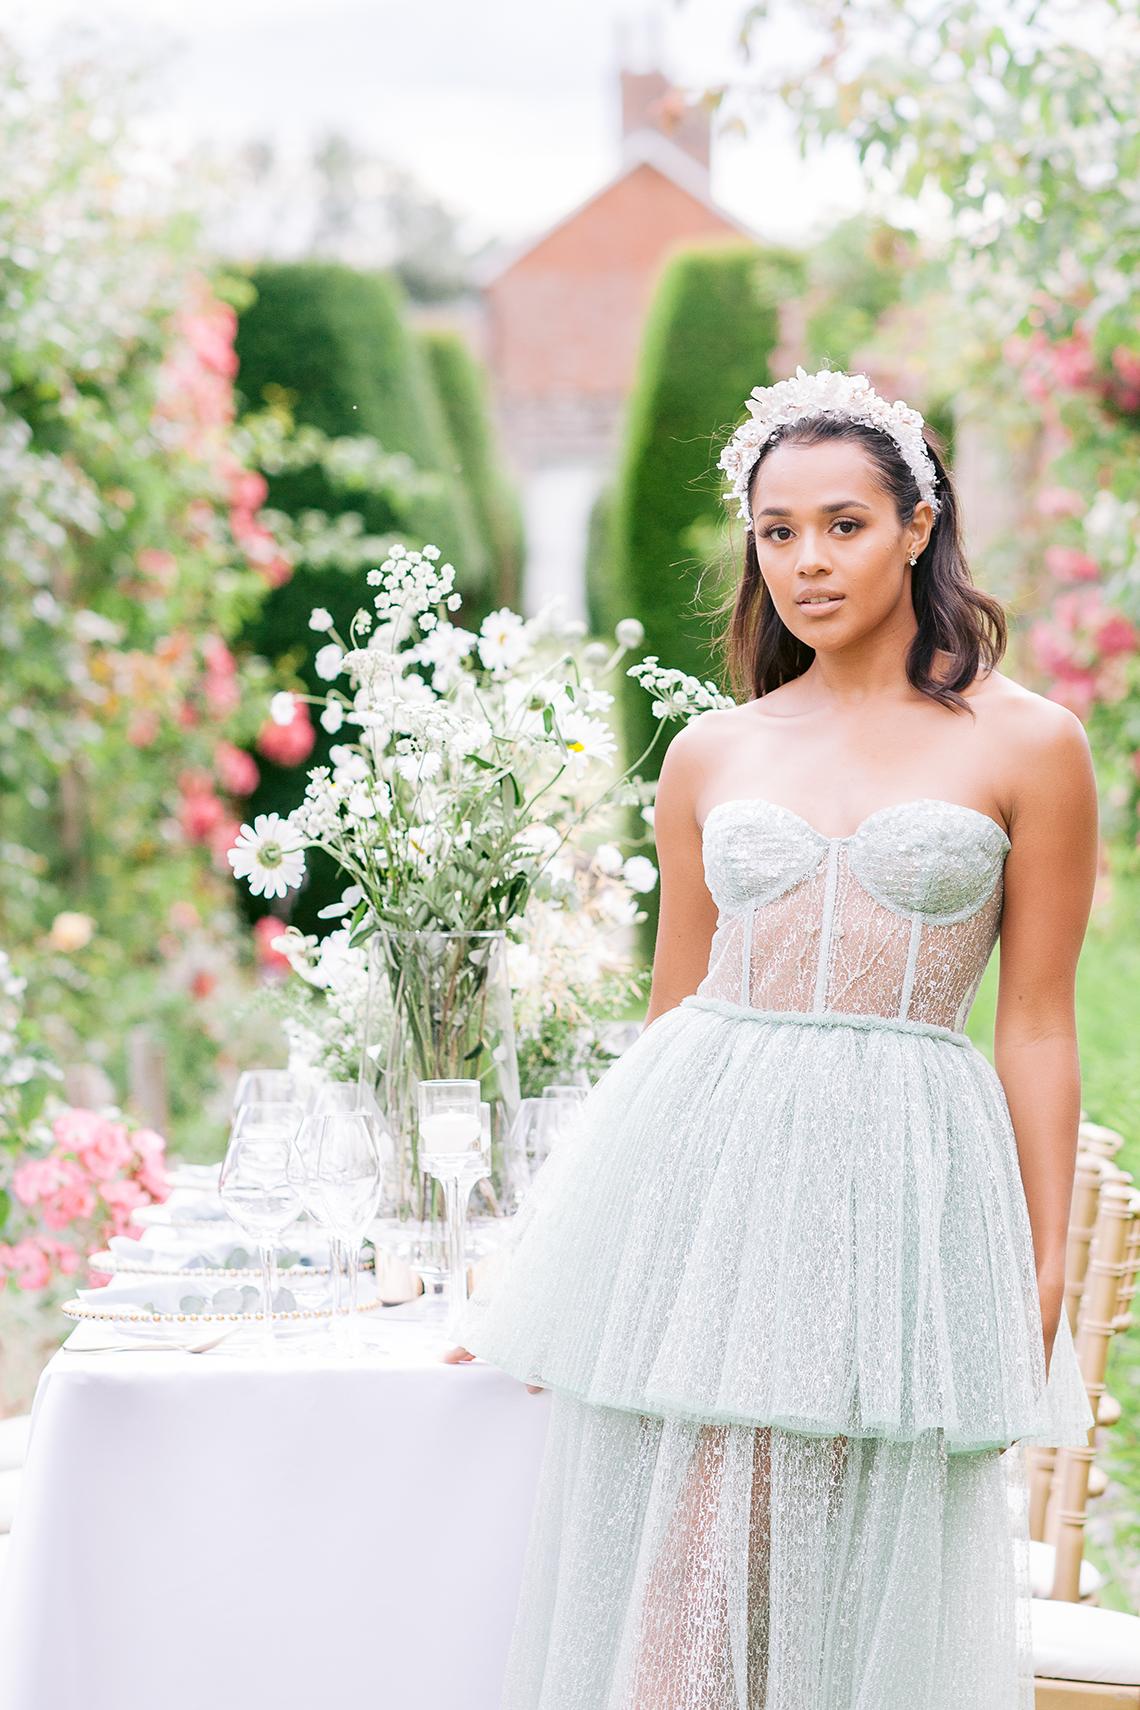 Elegant British Garden Inspired Wedding Ideas at Newburgh Priory – Felisiti Greis – Elsie Love Photography 55